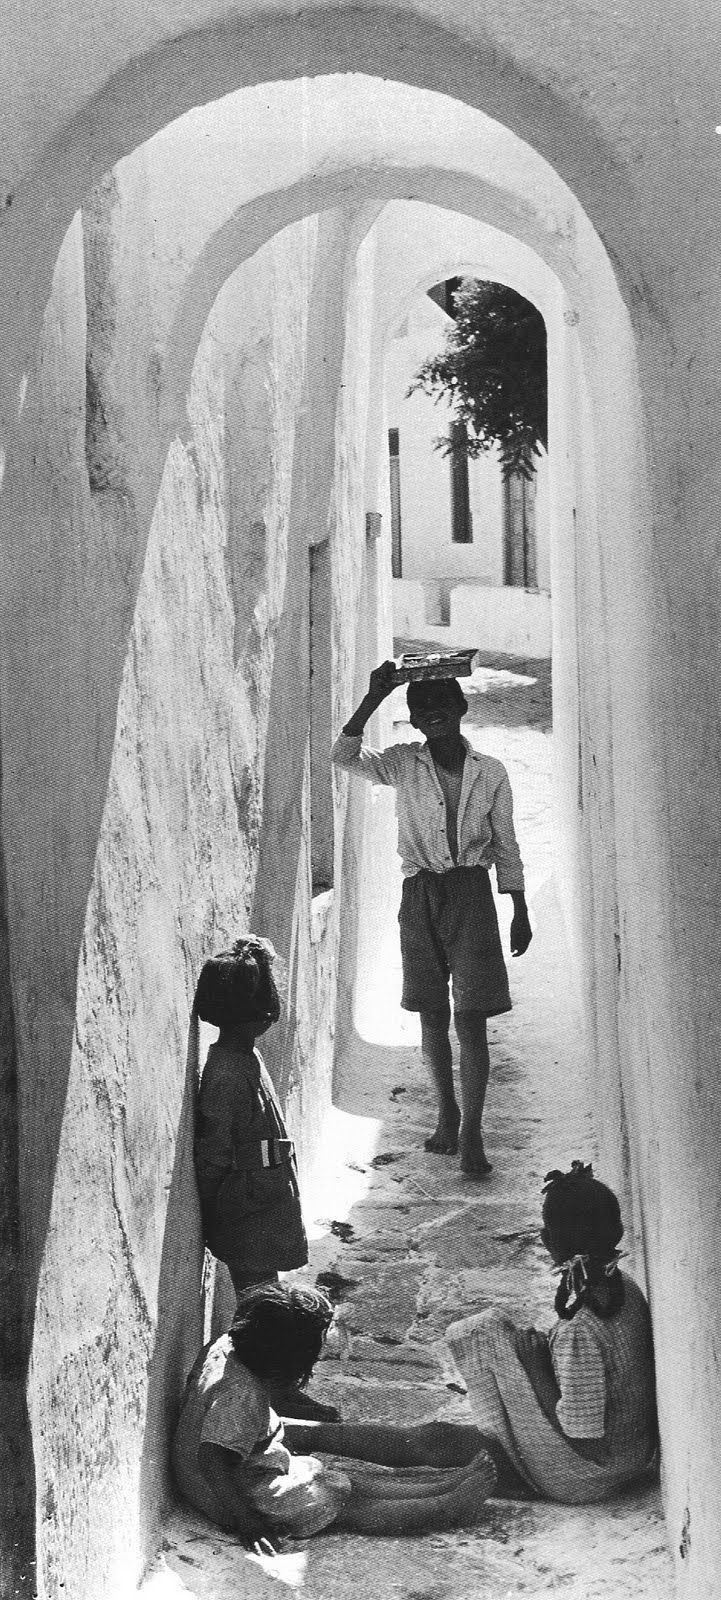 Mykonos, 1949 - Dimitris Harisiadis